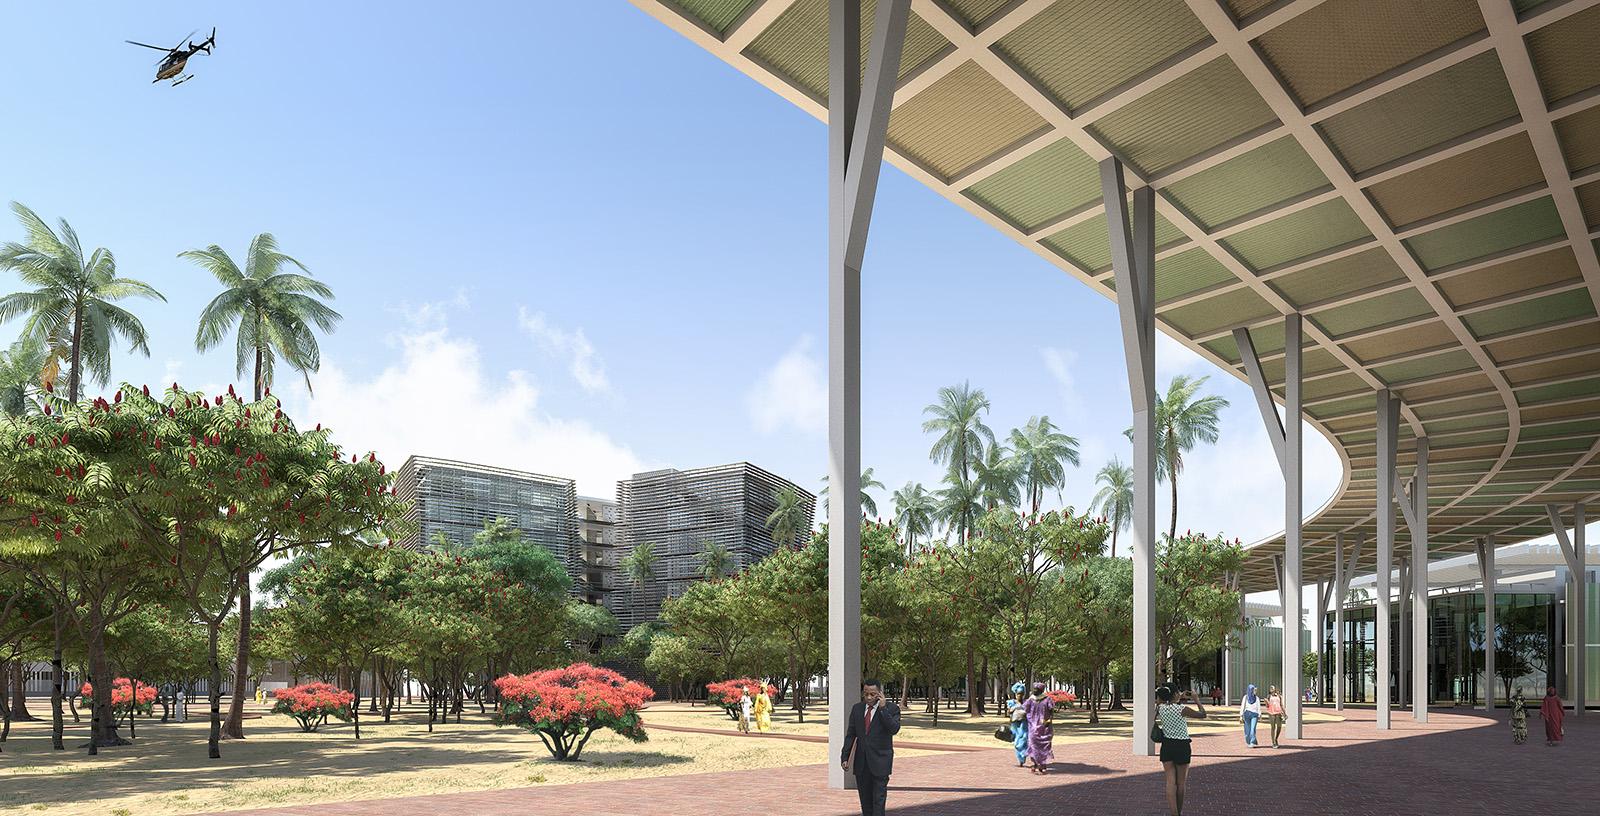 Parque tecnologico Senegal_002